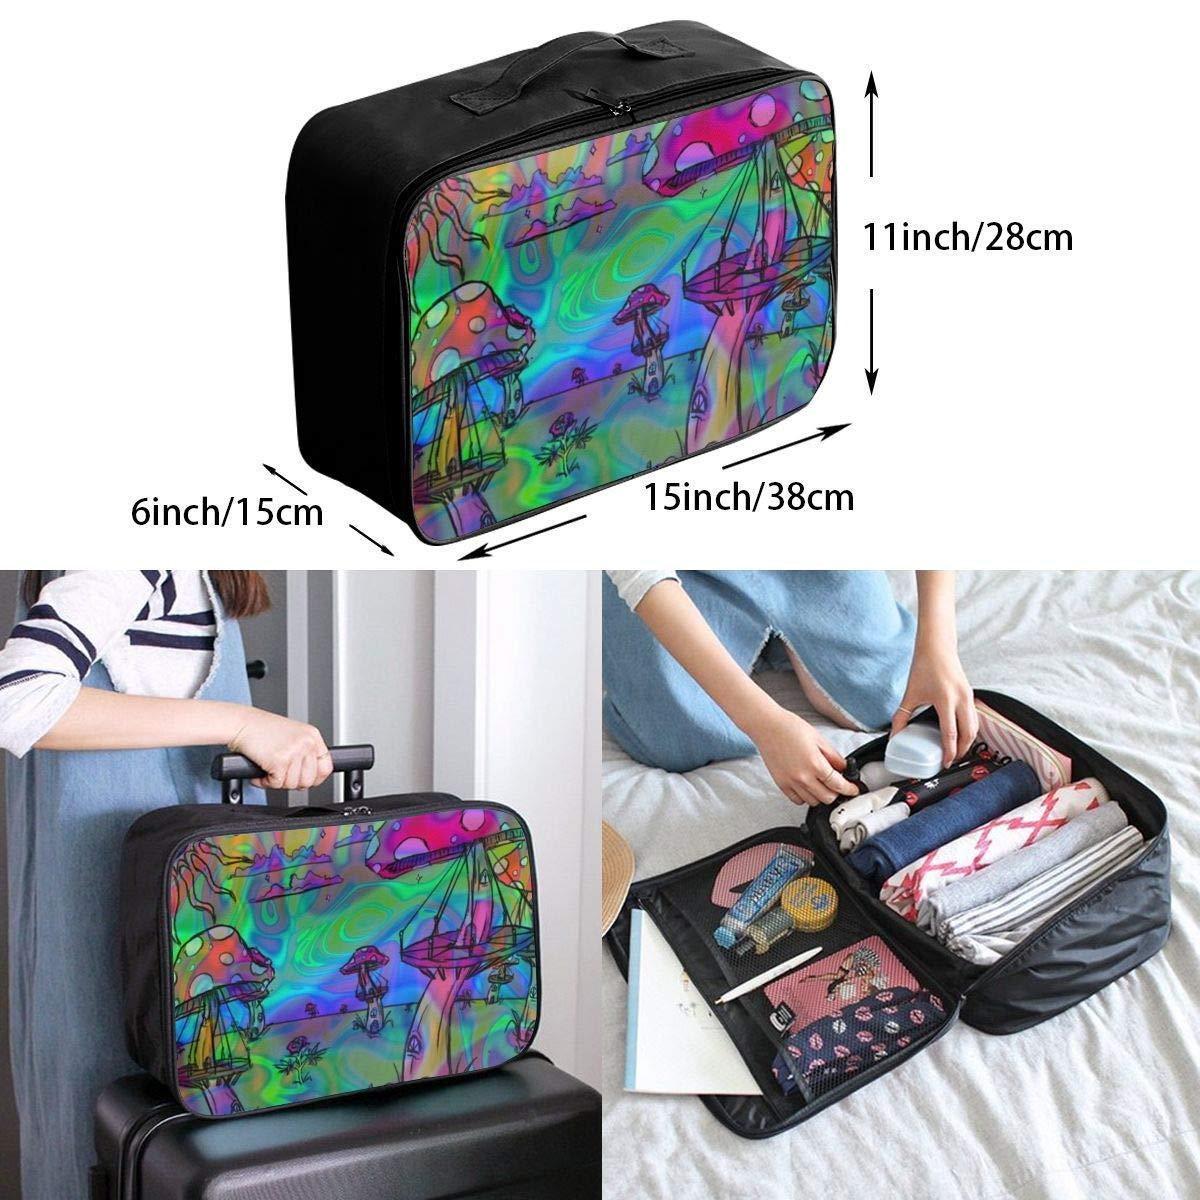 Psychedelic Trippy Mushroom Travel Duffel Bag Waterproof Fashion Lightweight Large Capacity Portable Duffel Bag for Men /& Women JTRVW Luggage Bags for Travel